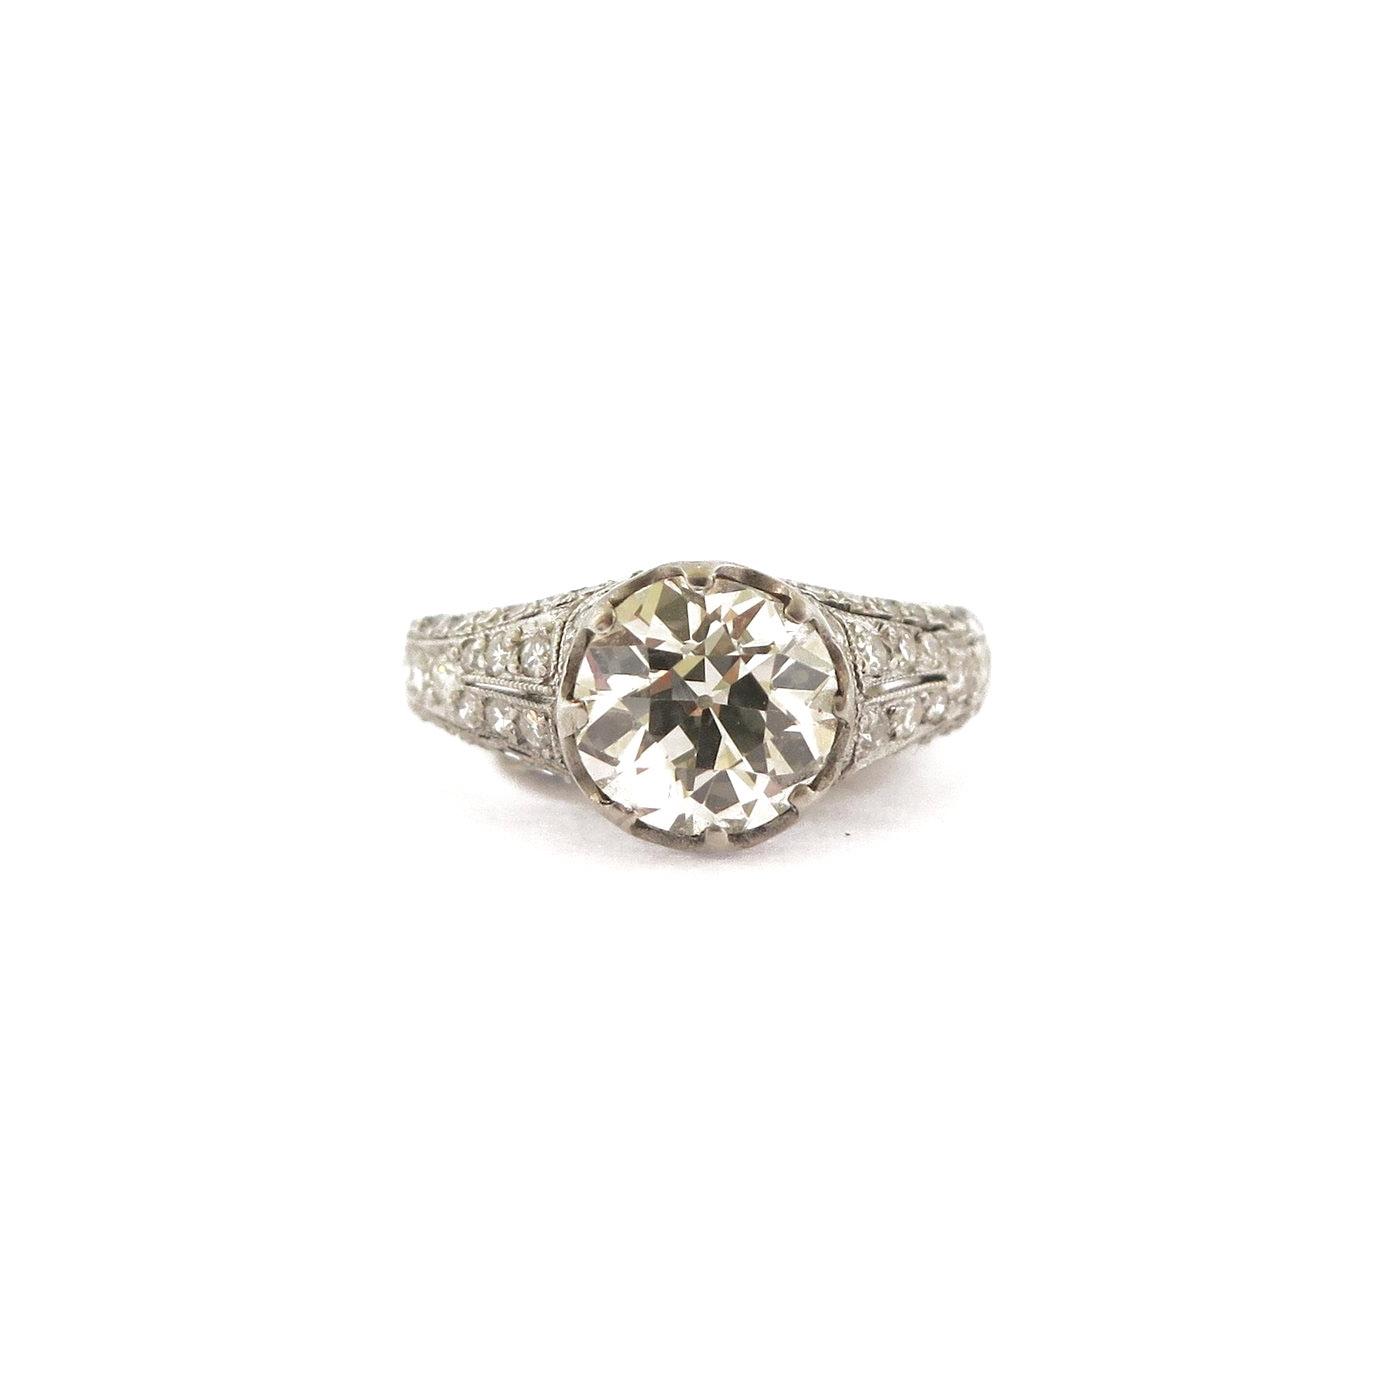 1.54 ct Diamond Solitaire Ring